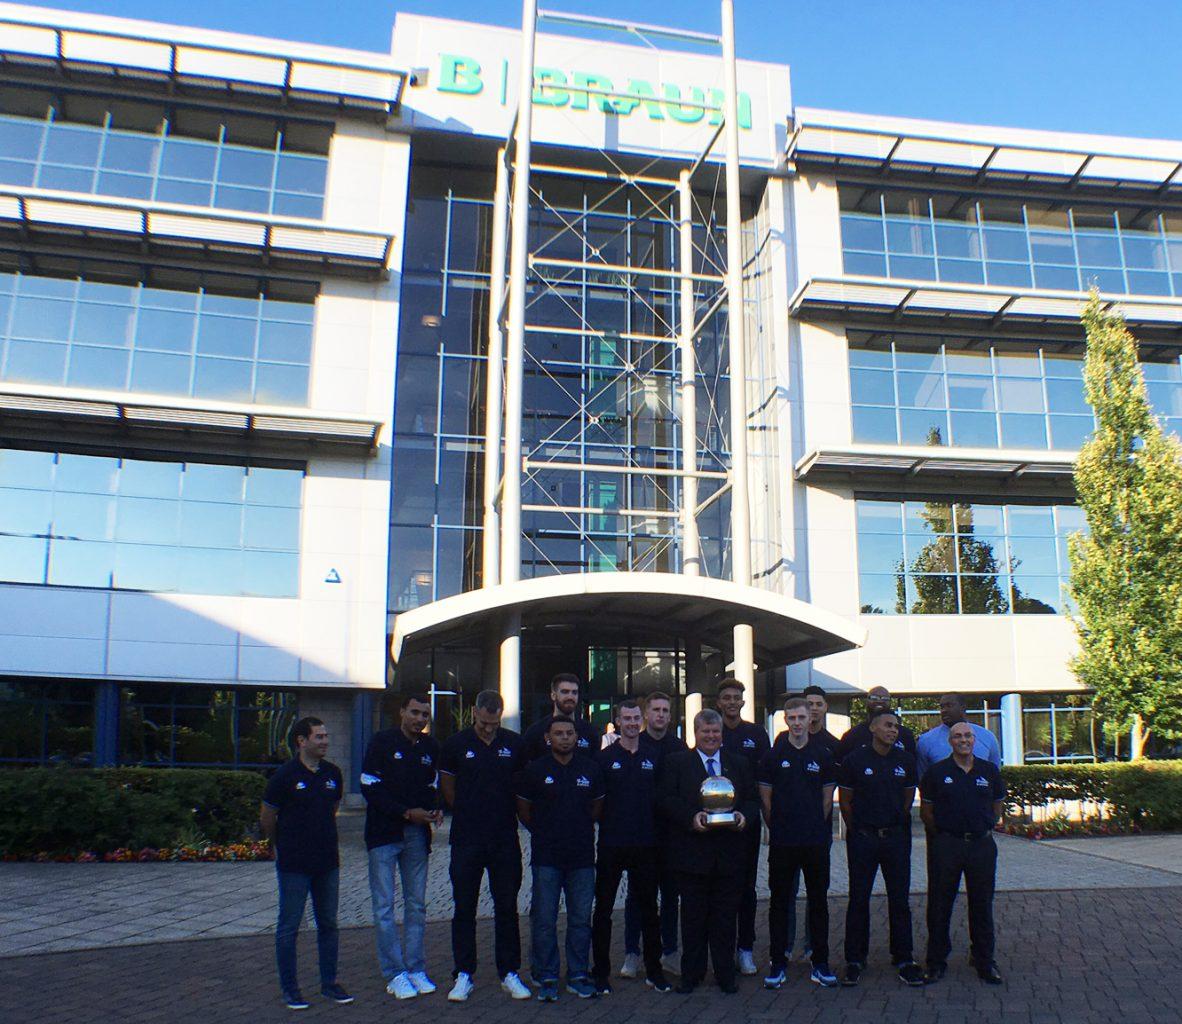 Sheffield Sharks 2016/17 squad announced at B  Braun - Sheffield